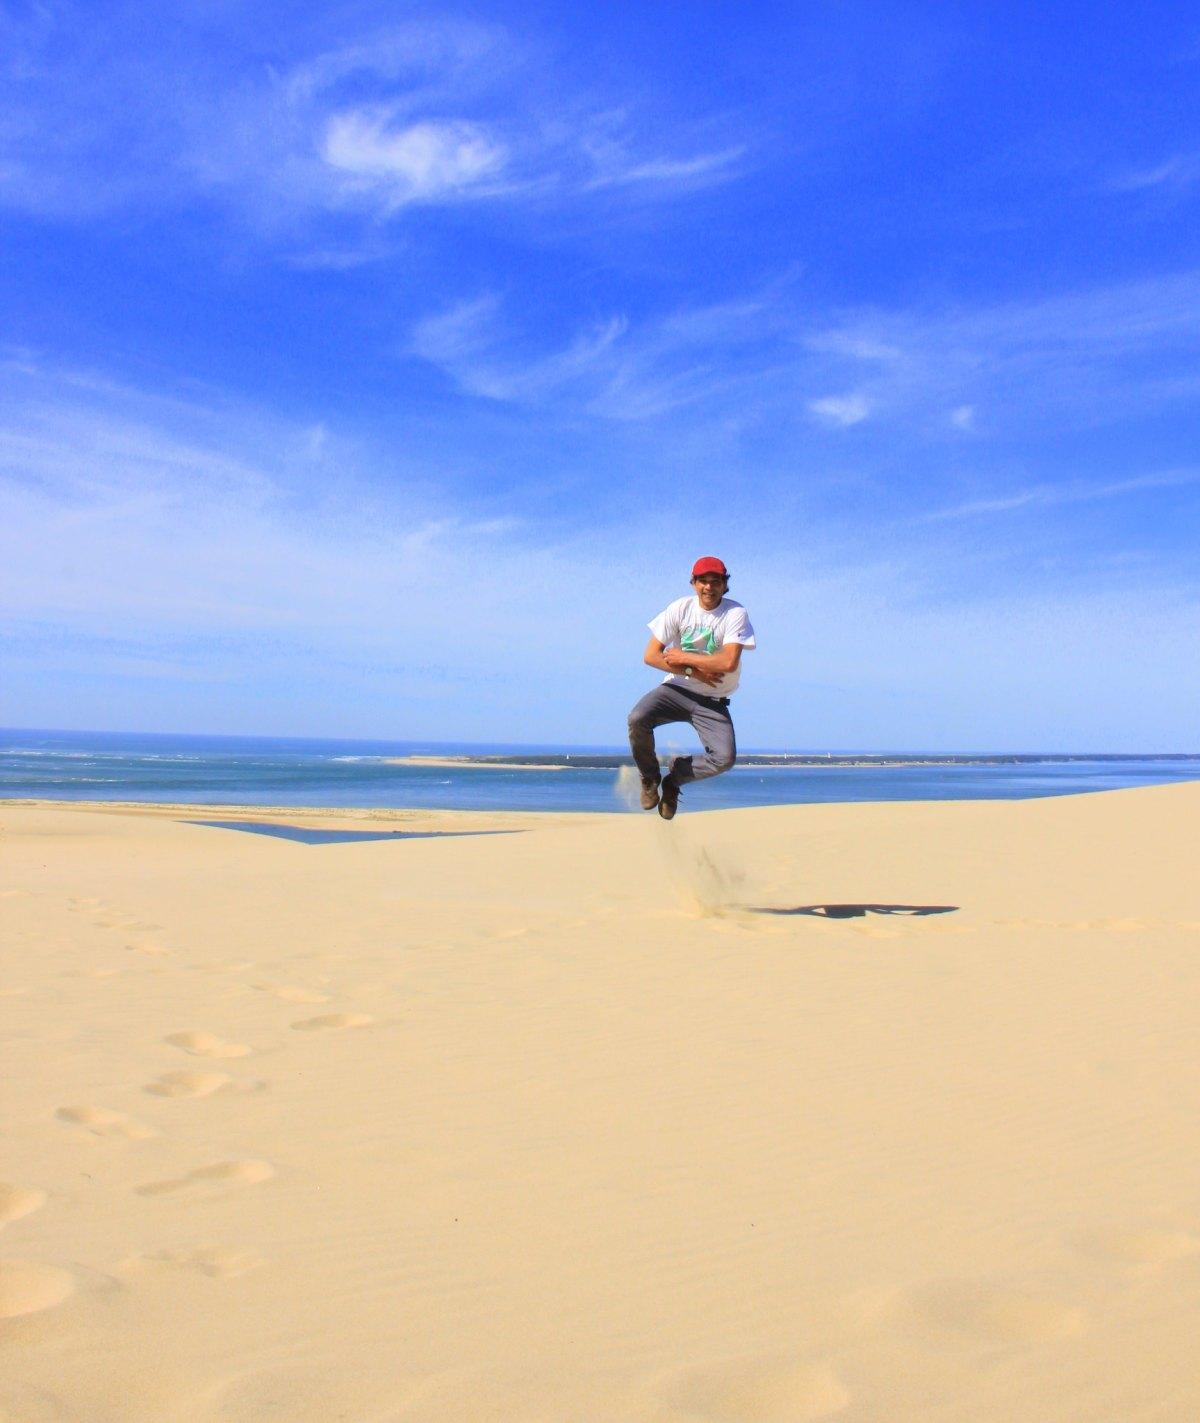 Shifting dunes of Dune de Pilat